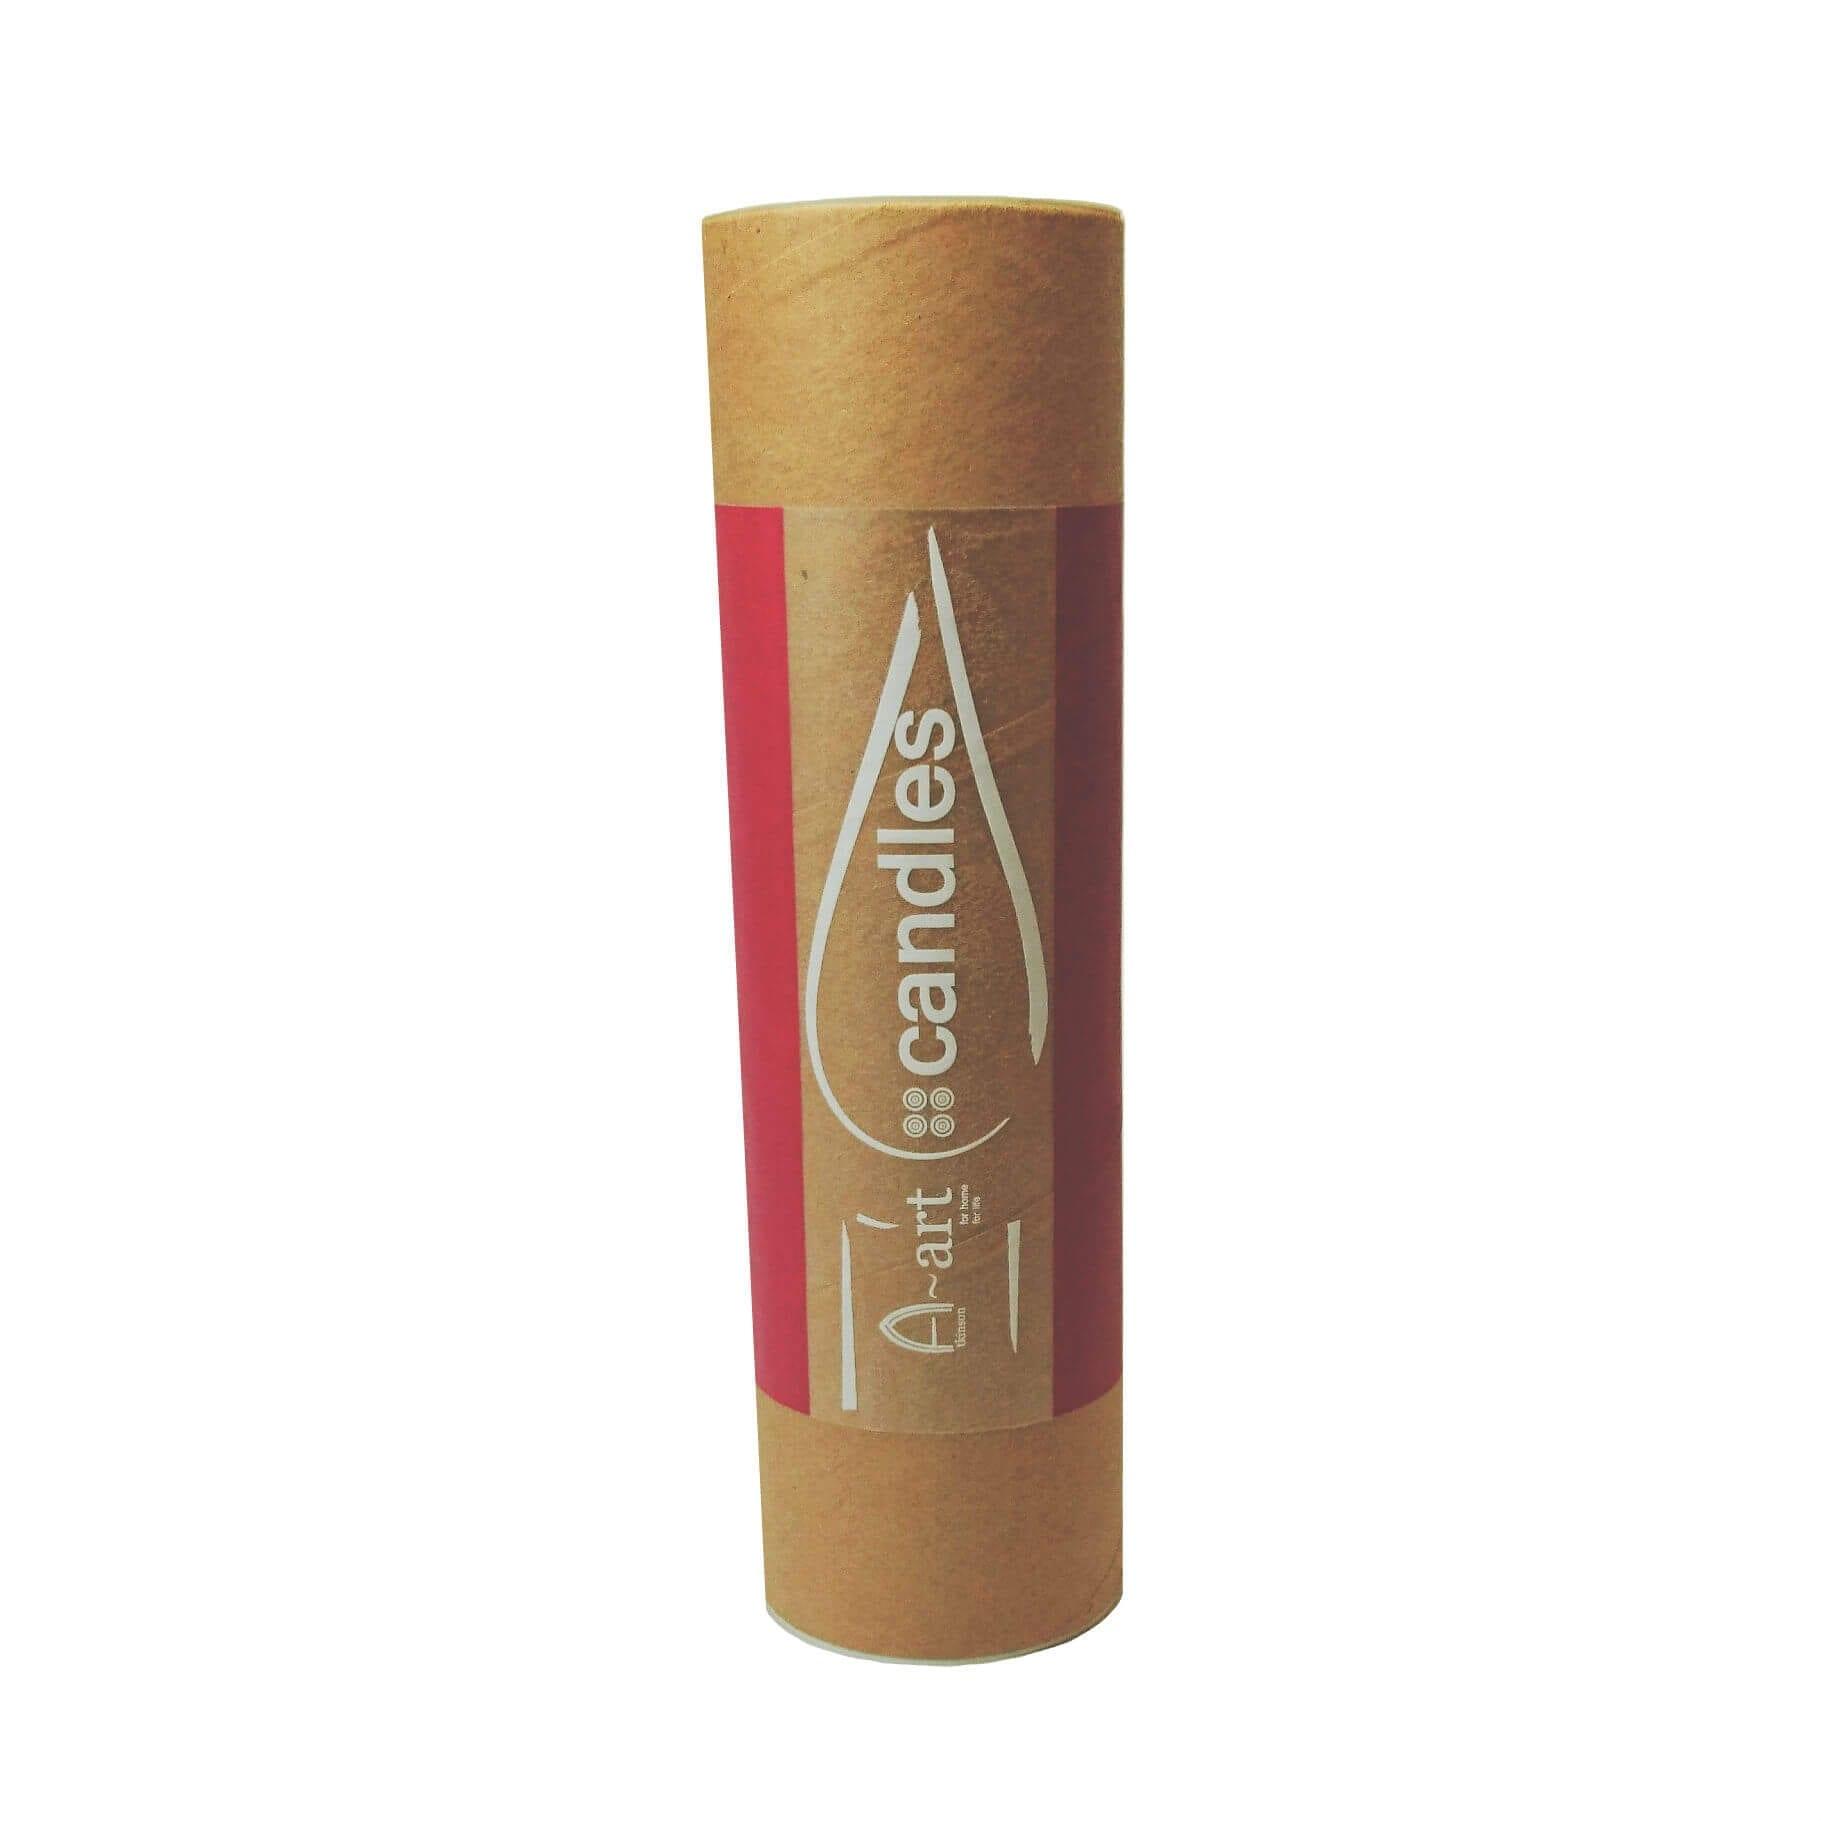 rhubarb-pink-dinner-candles-storage-tube